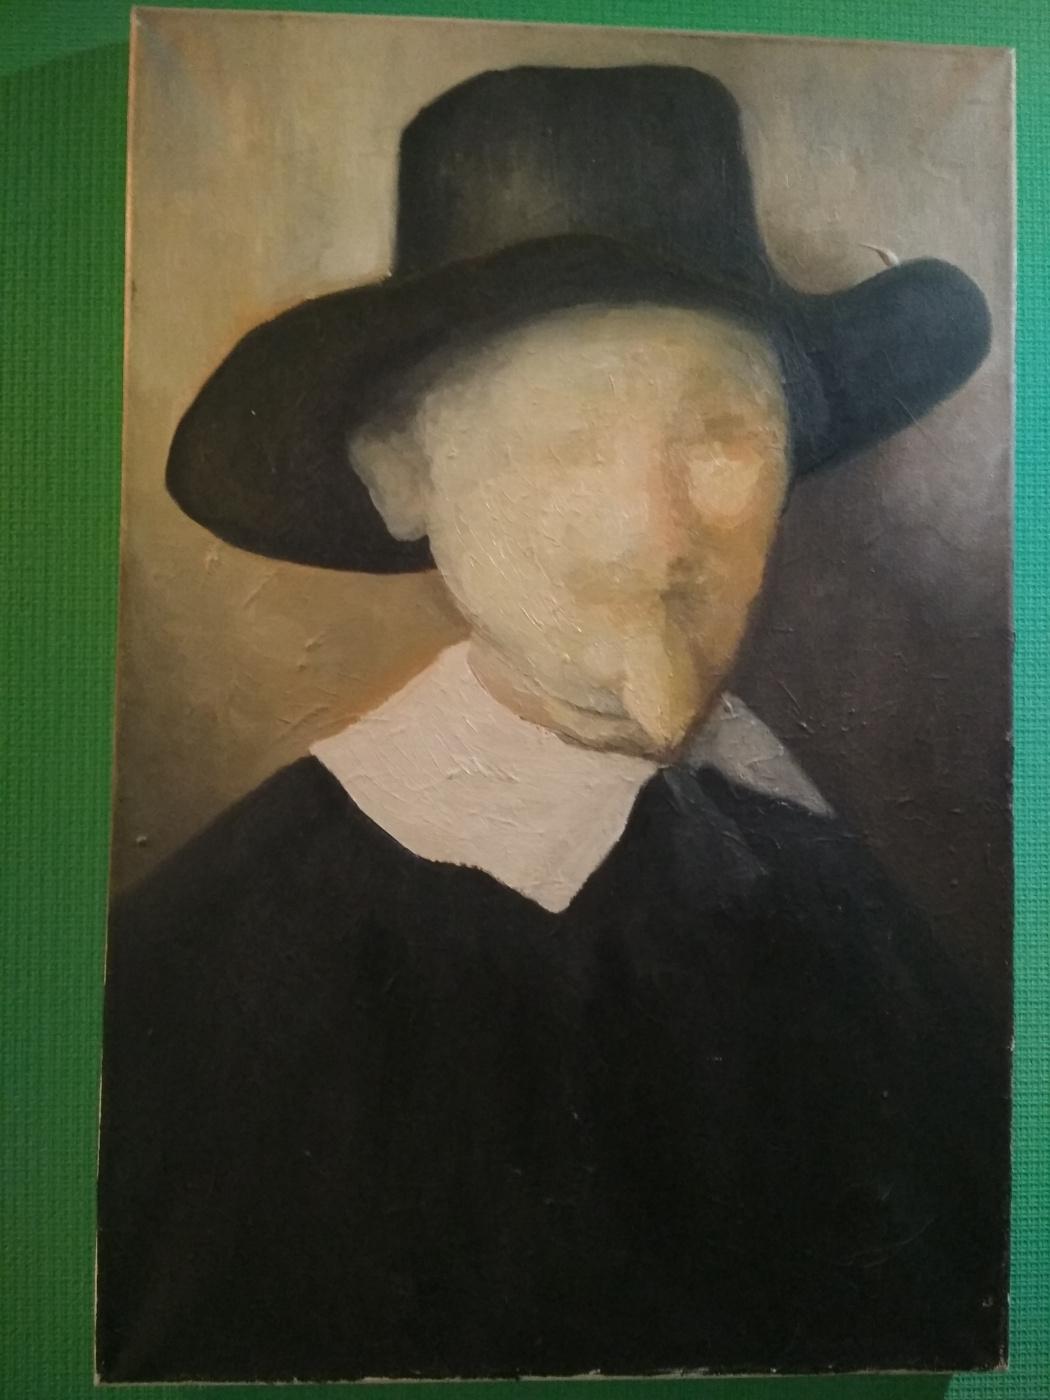 Unknown artist. Pasteur the Faceless